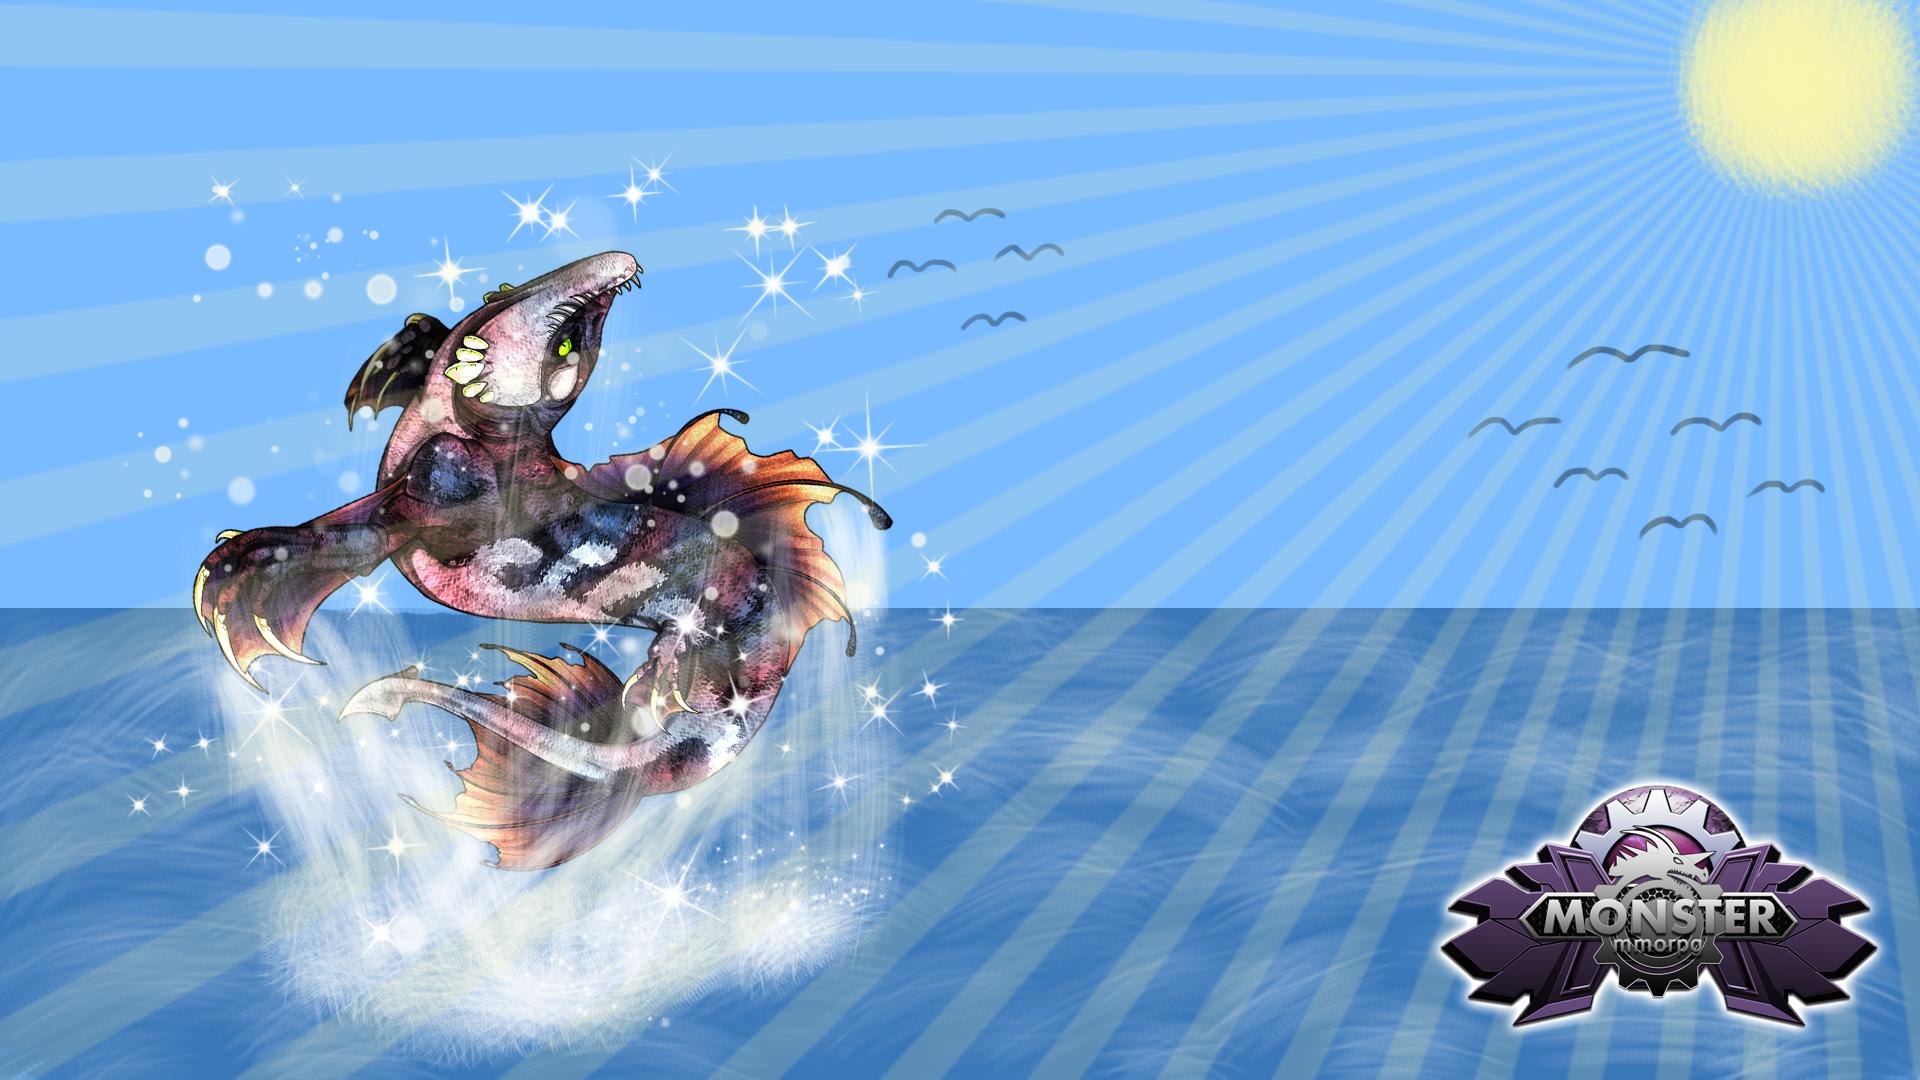 MonsterMMORPG WallPaper [#32 Sarcuda] / PSD File